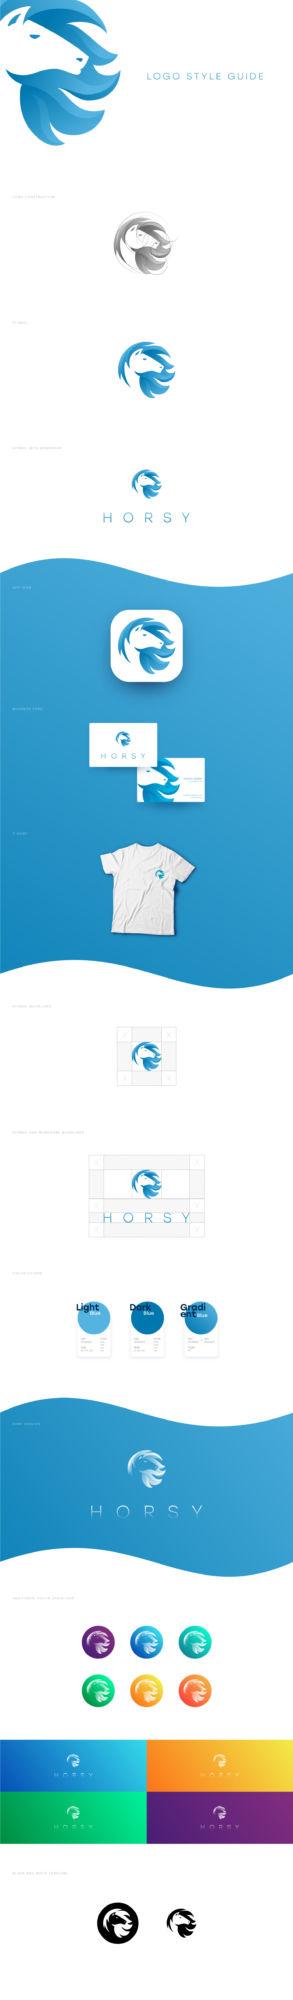 horsy_logo_style_guide_tubik_studio